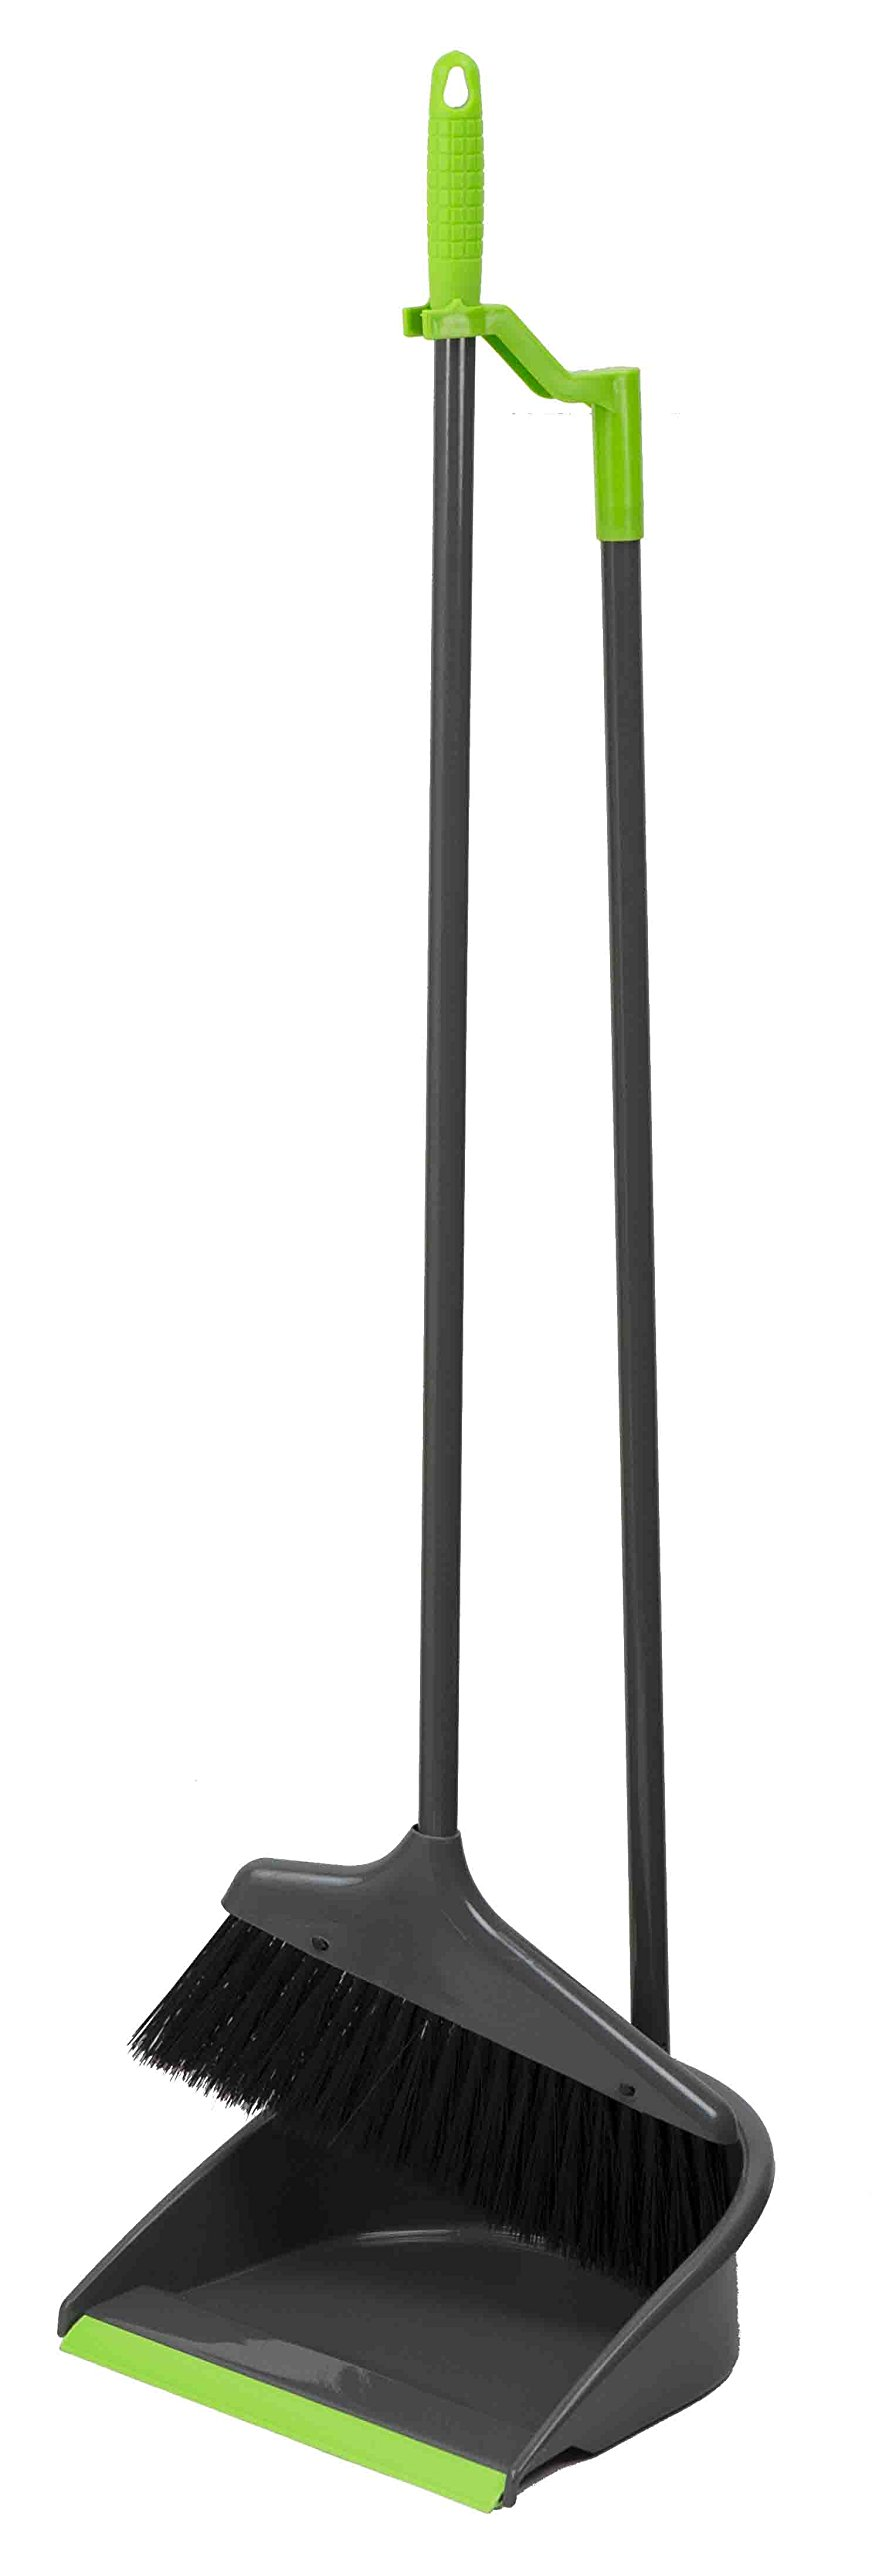 Home Basics Brilliant Collection Long Handled Broom, Grey (Broom & Dustpan Set)